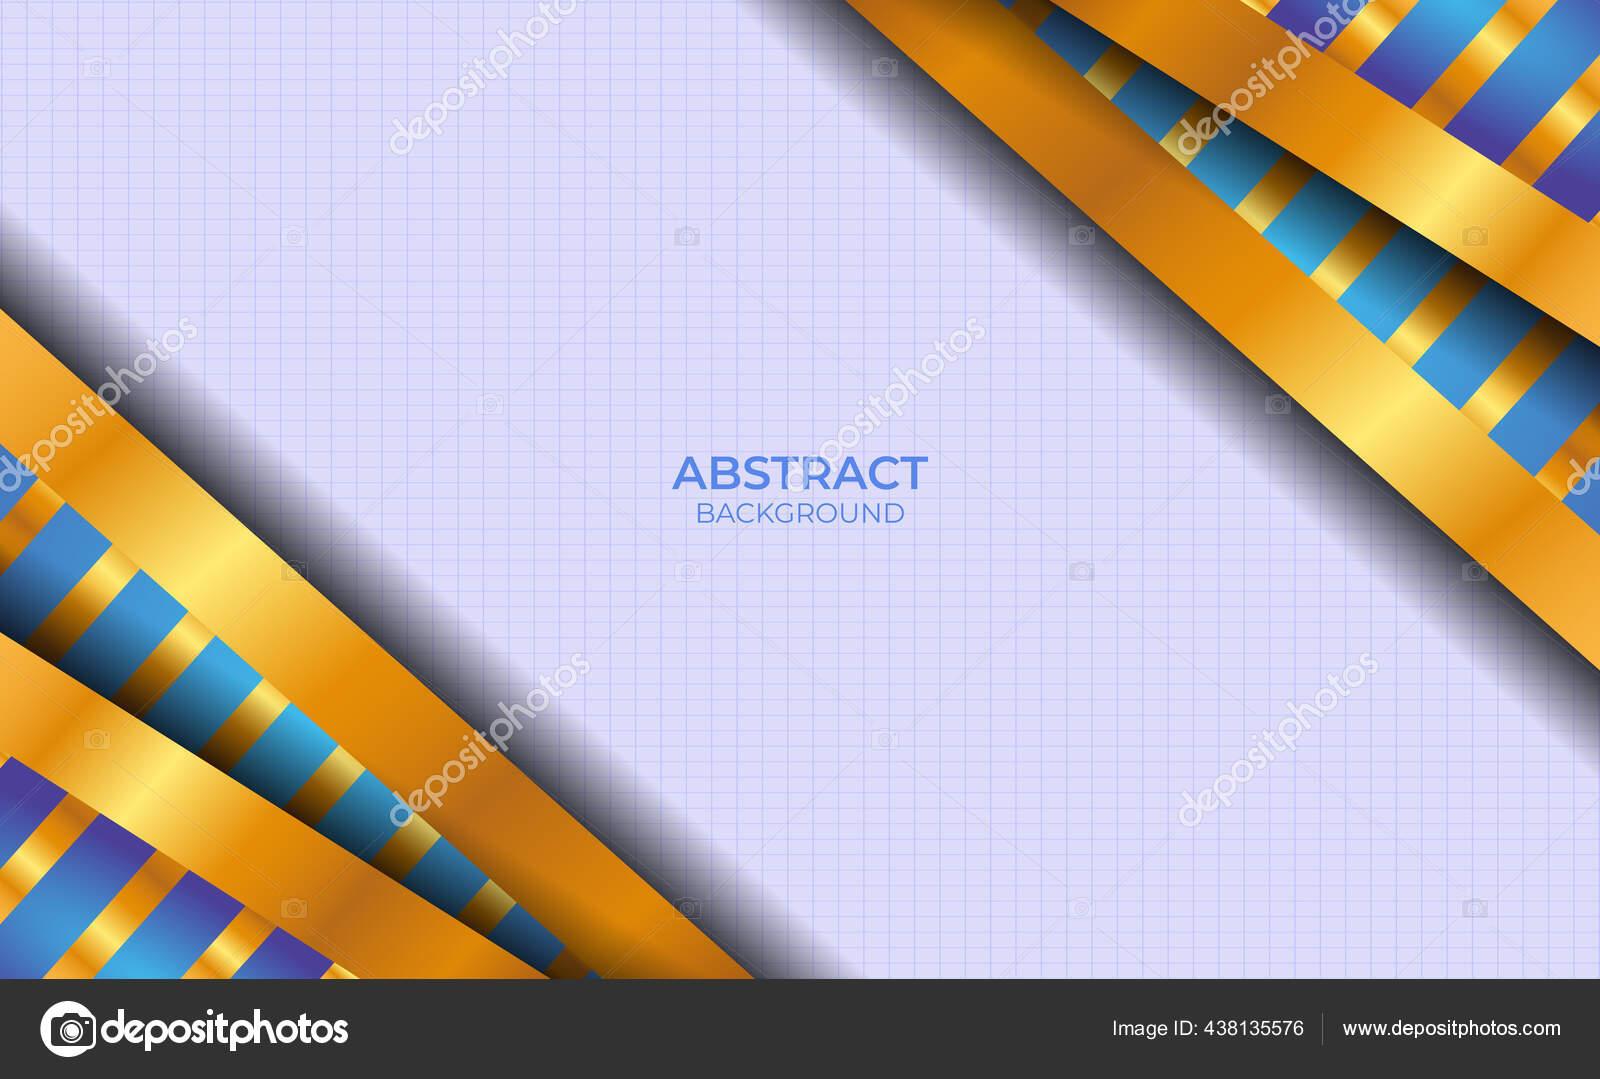 Latar Belakang Biru Dan Emas Abstrak — Stok Vektor © MZNF #438135576